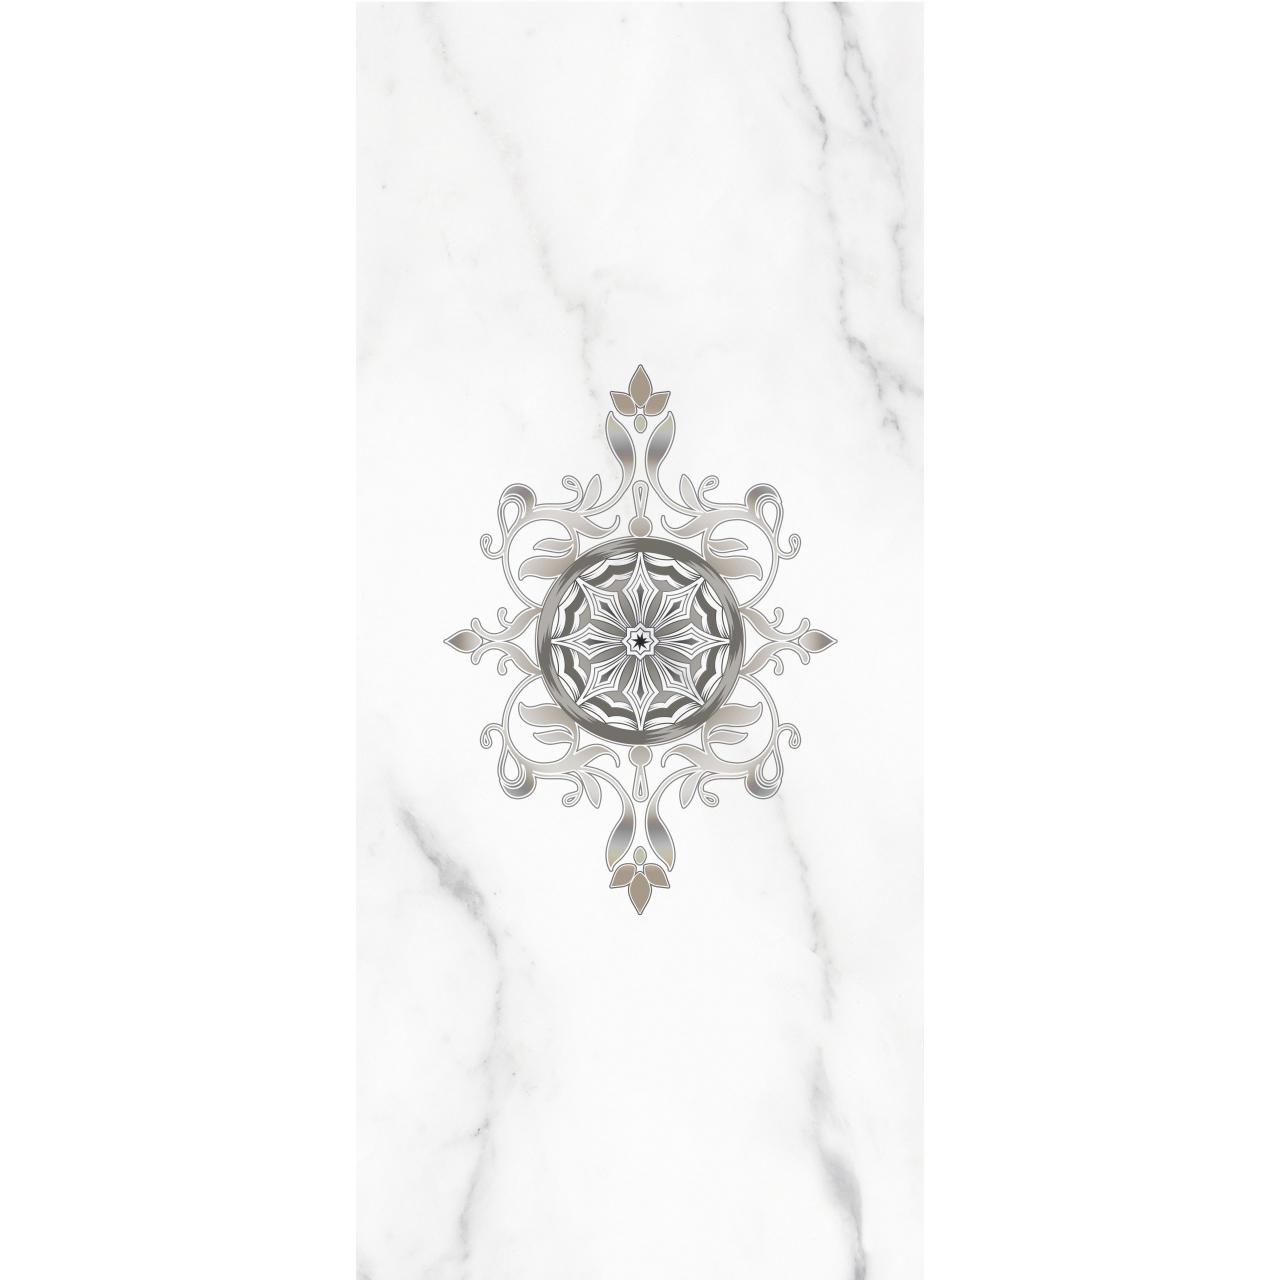 Фото - Декор PiezaRosa Crystal 20x45 см Белый декор piezarosa цезарь 1 серый 25х40 см 342571